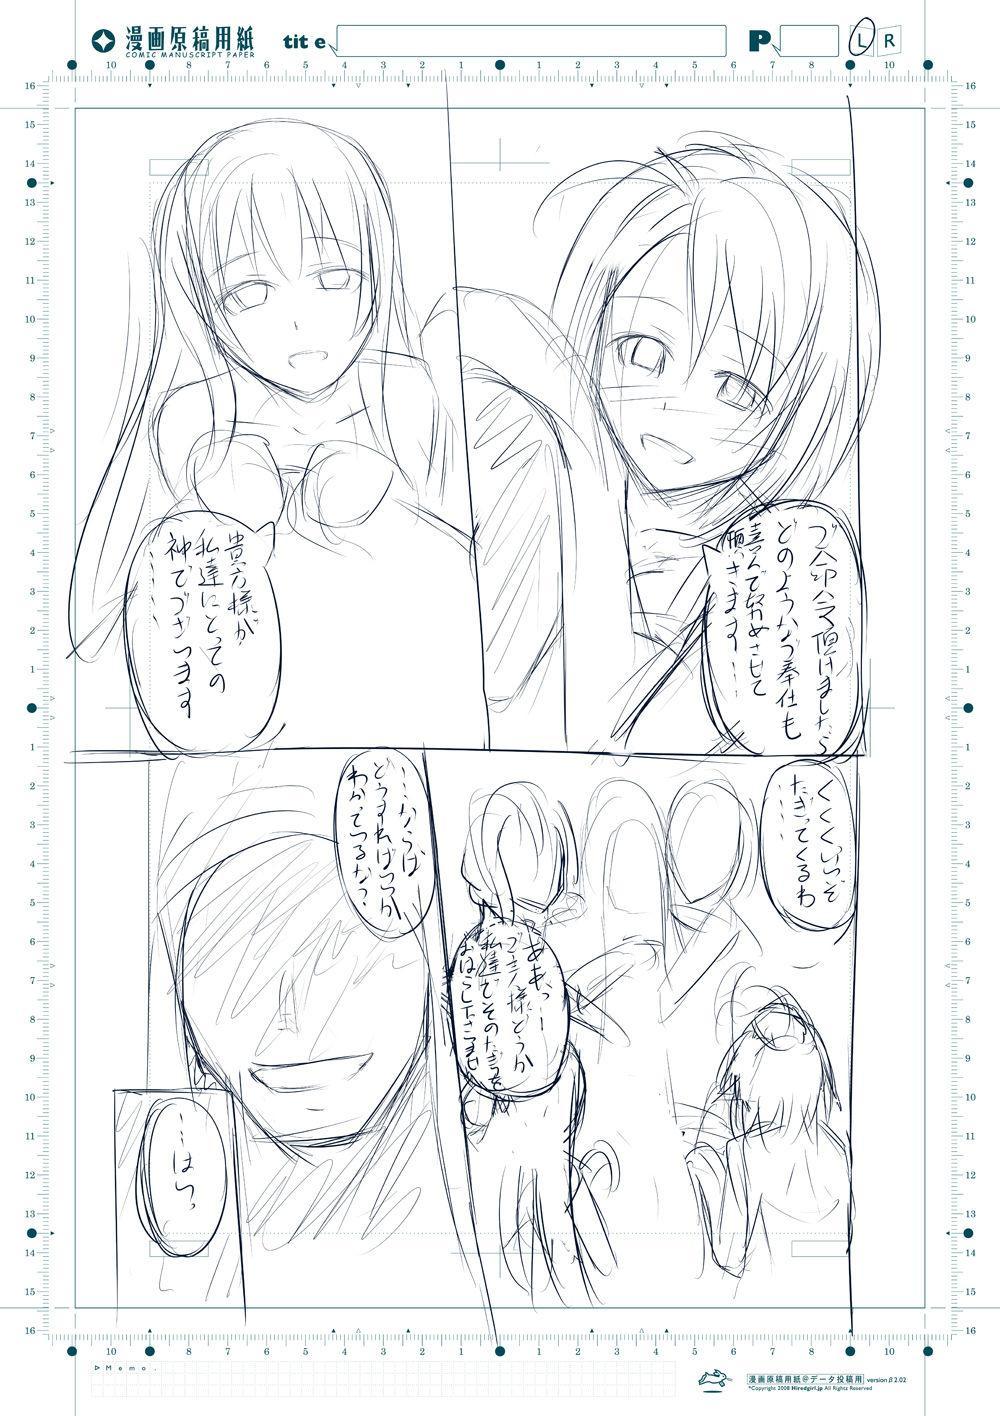 Goblin Slayer Sennou Manga 25